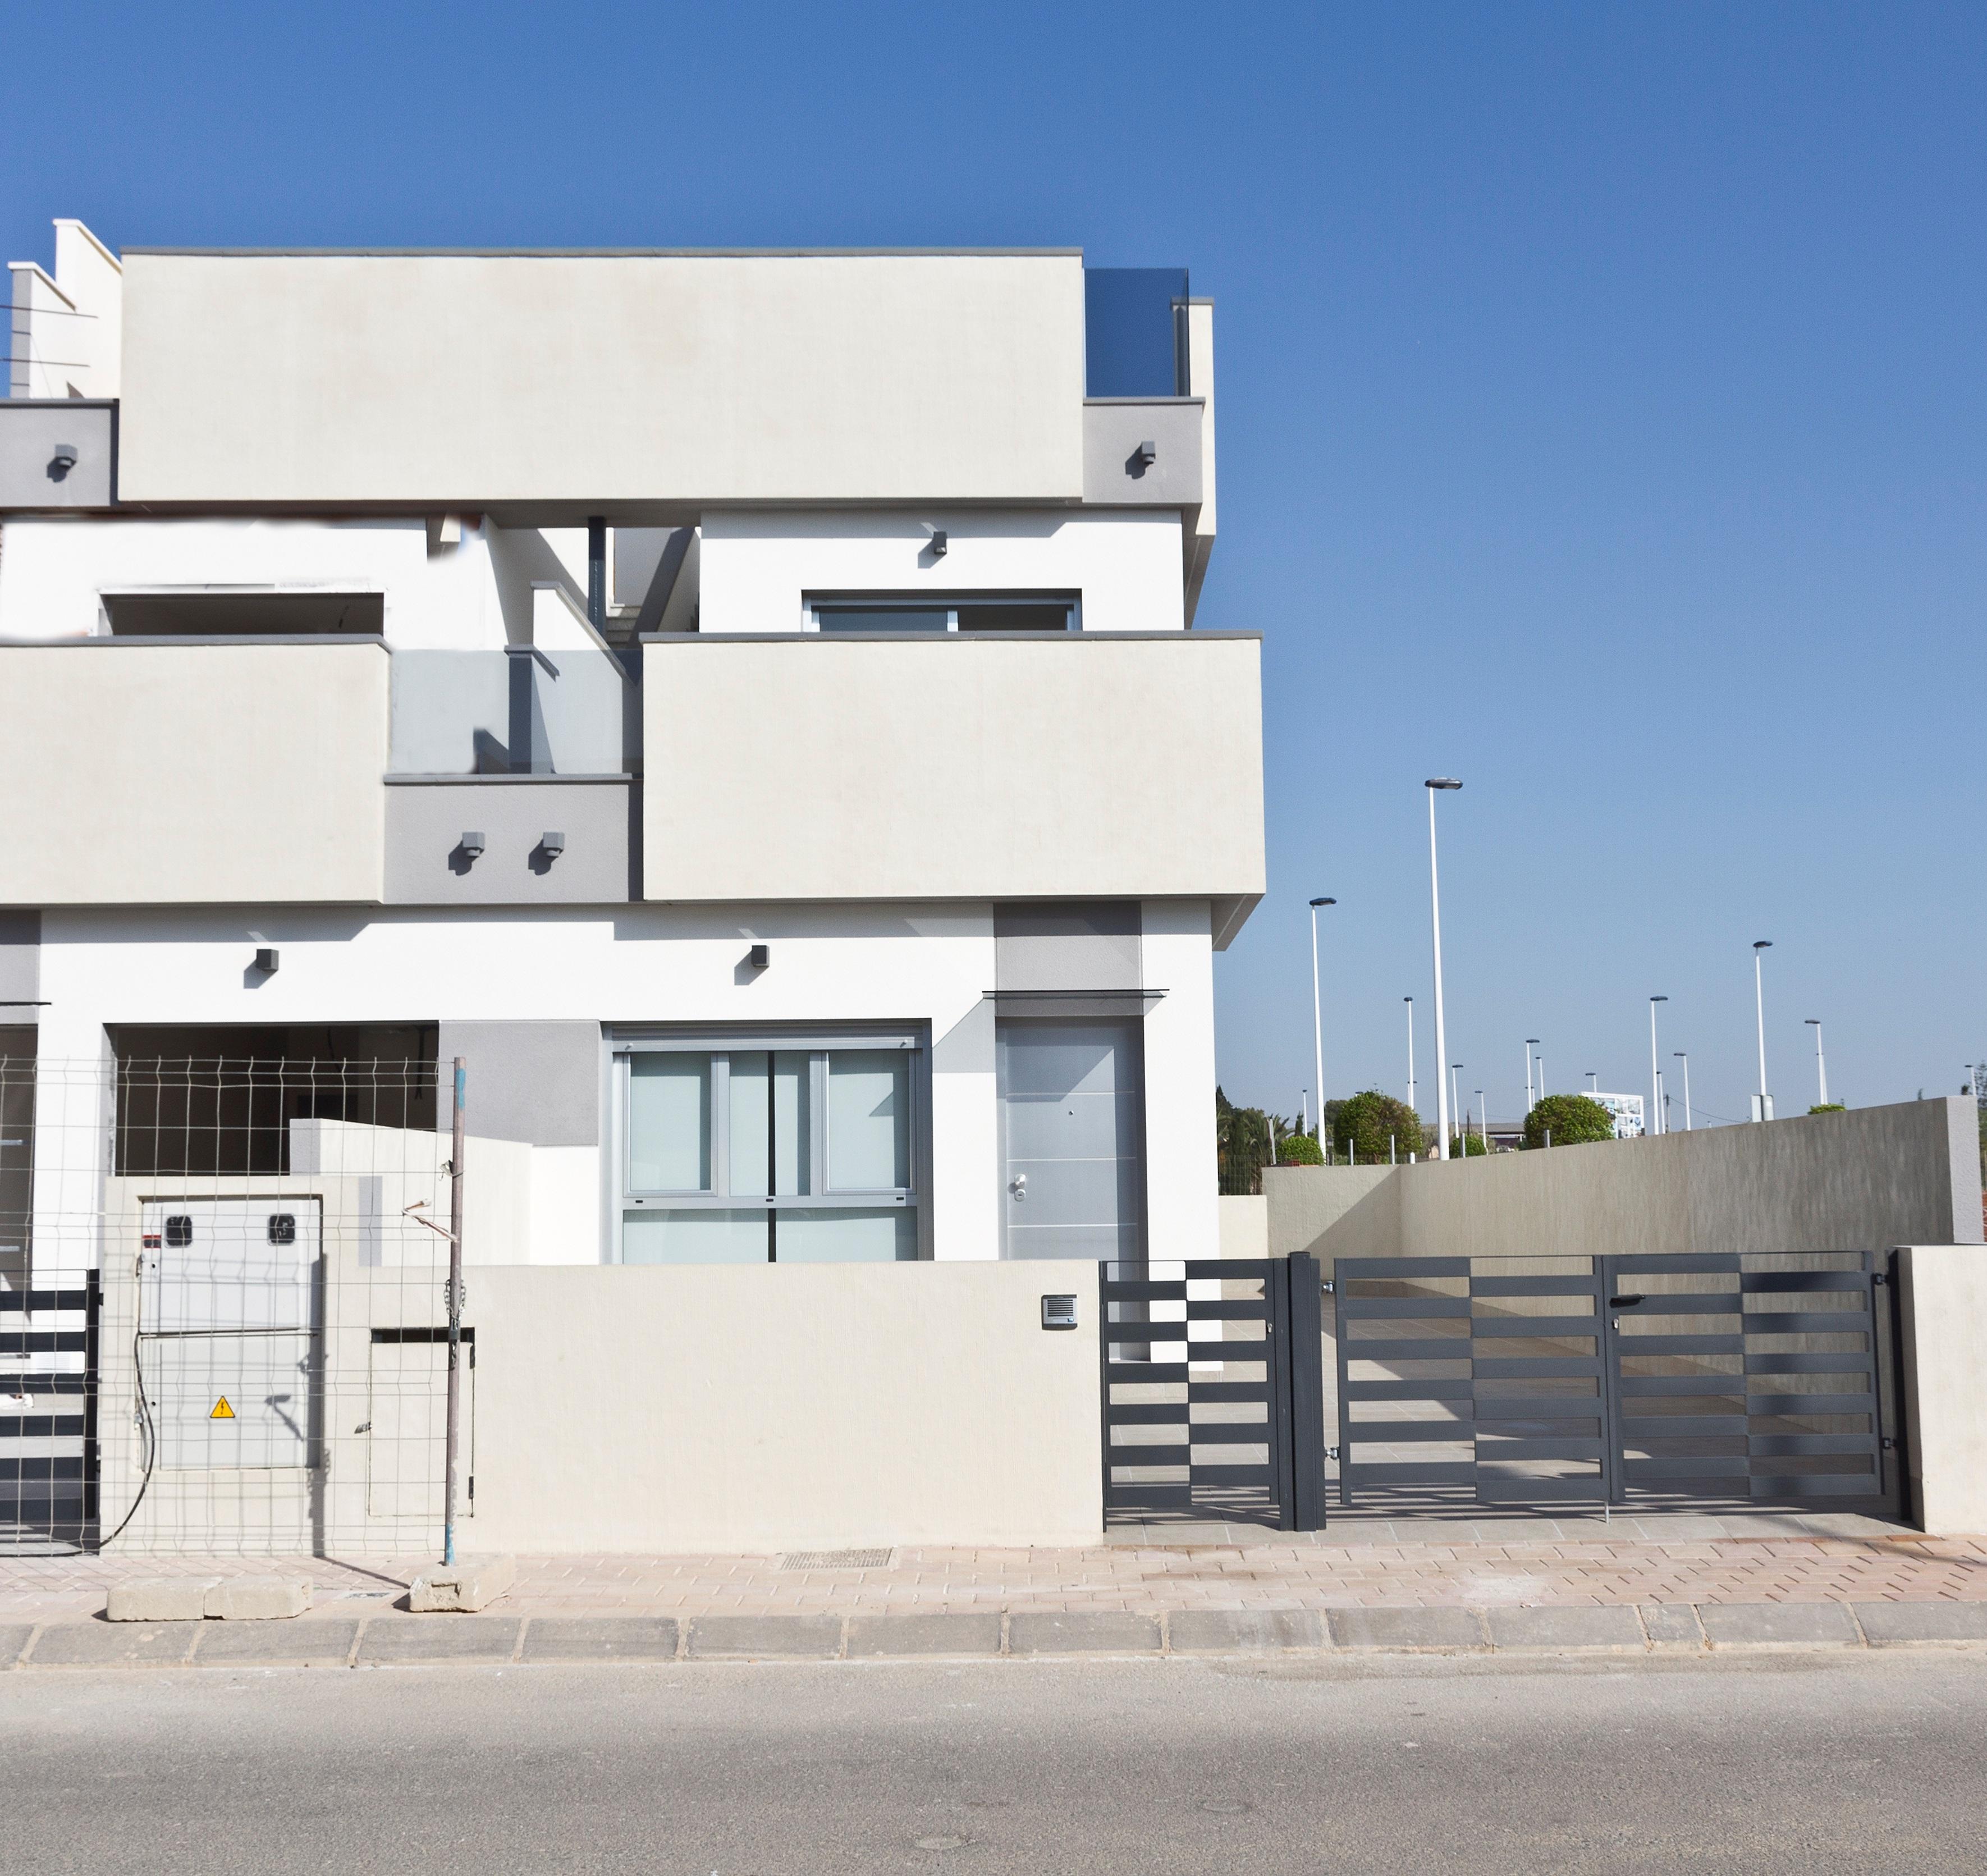 3 bedroom House for sale in San Pedro del Pinatar